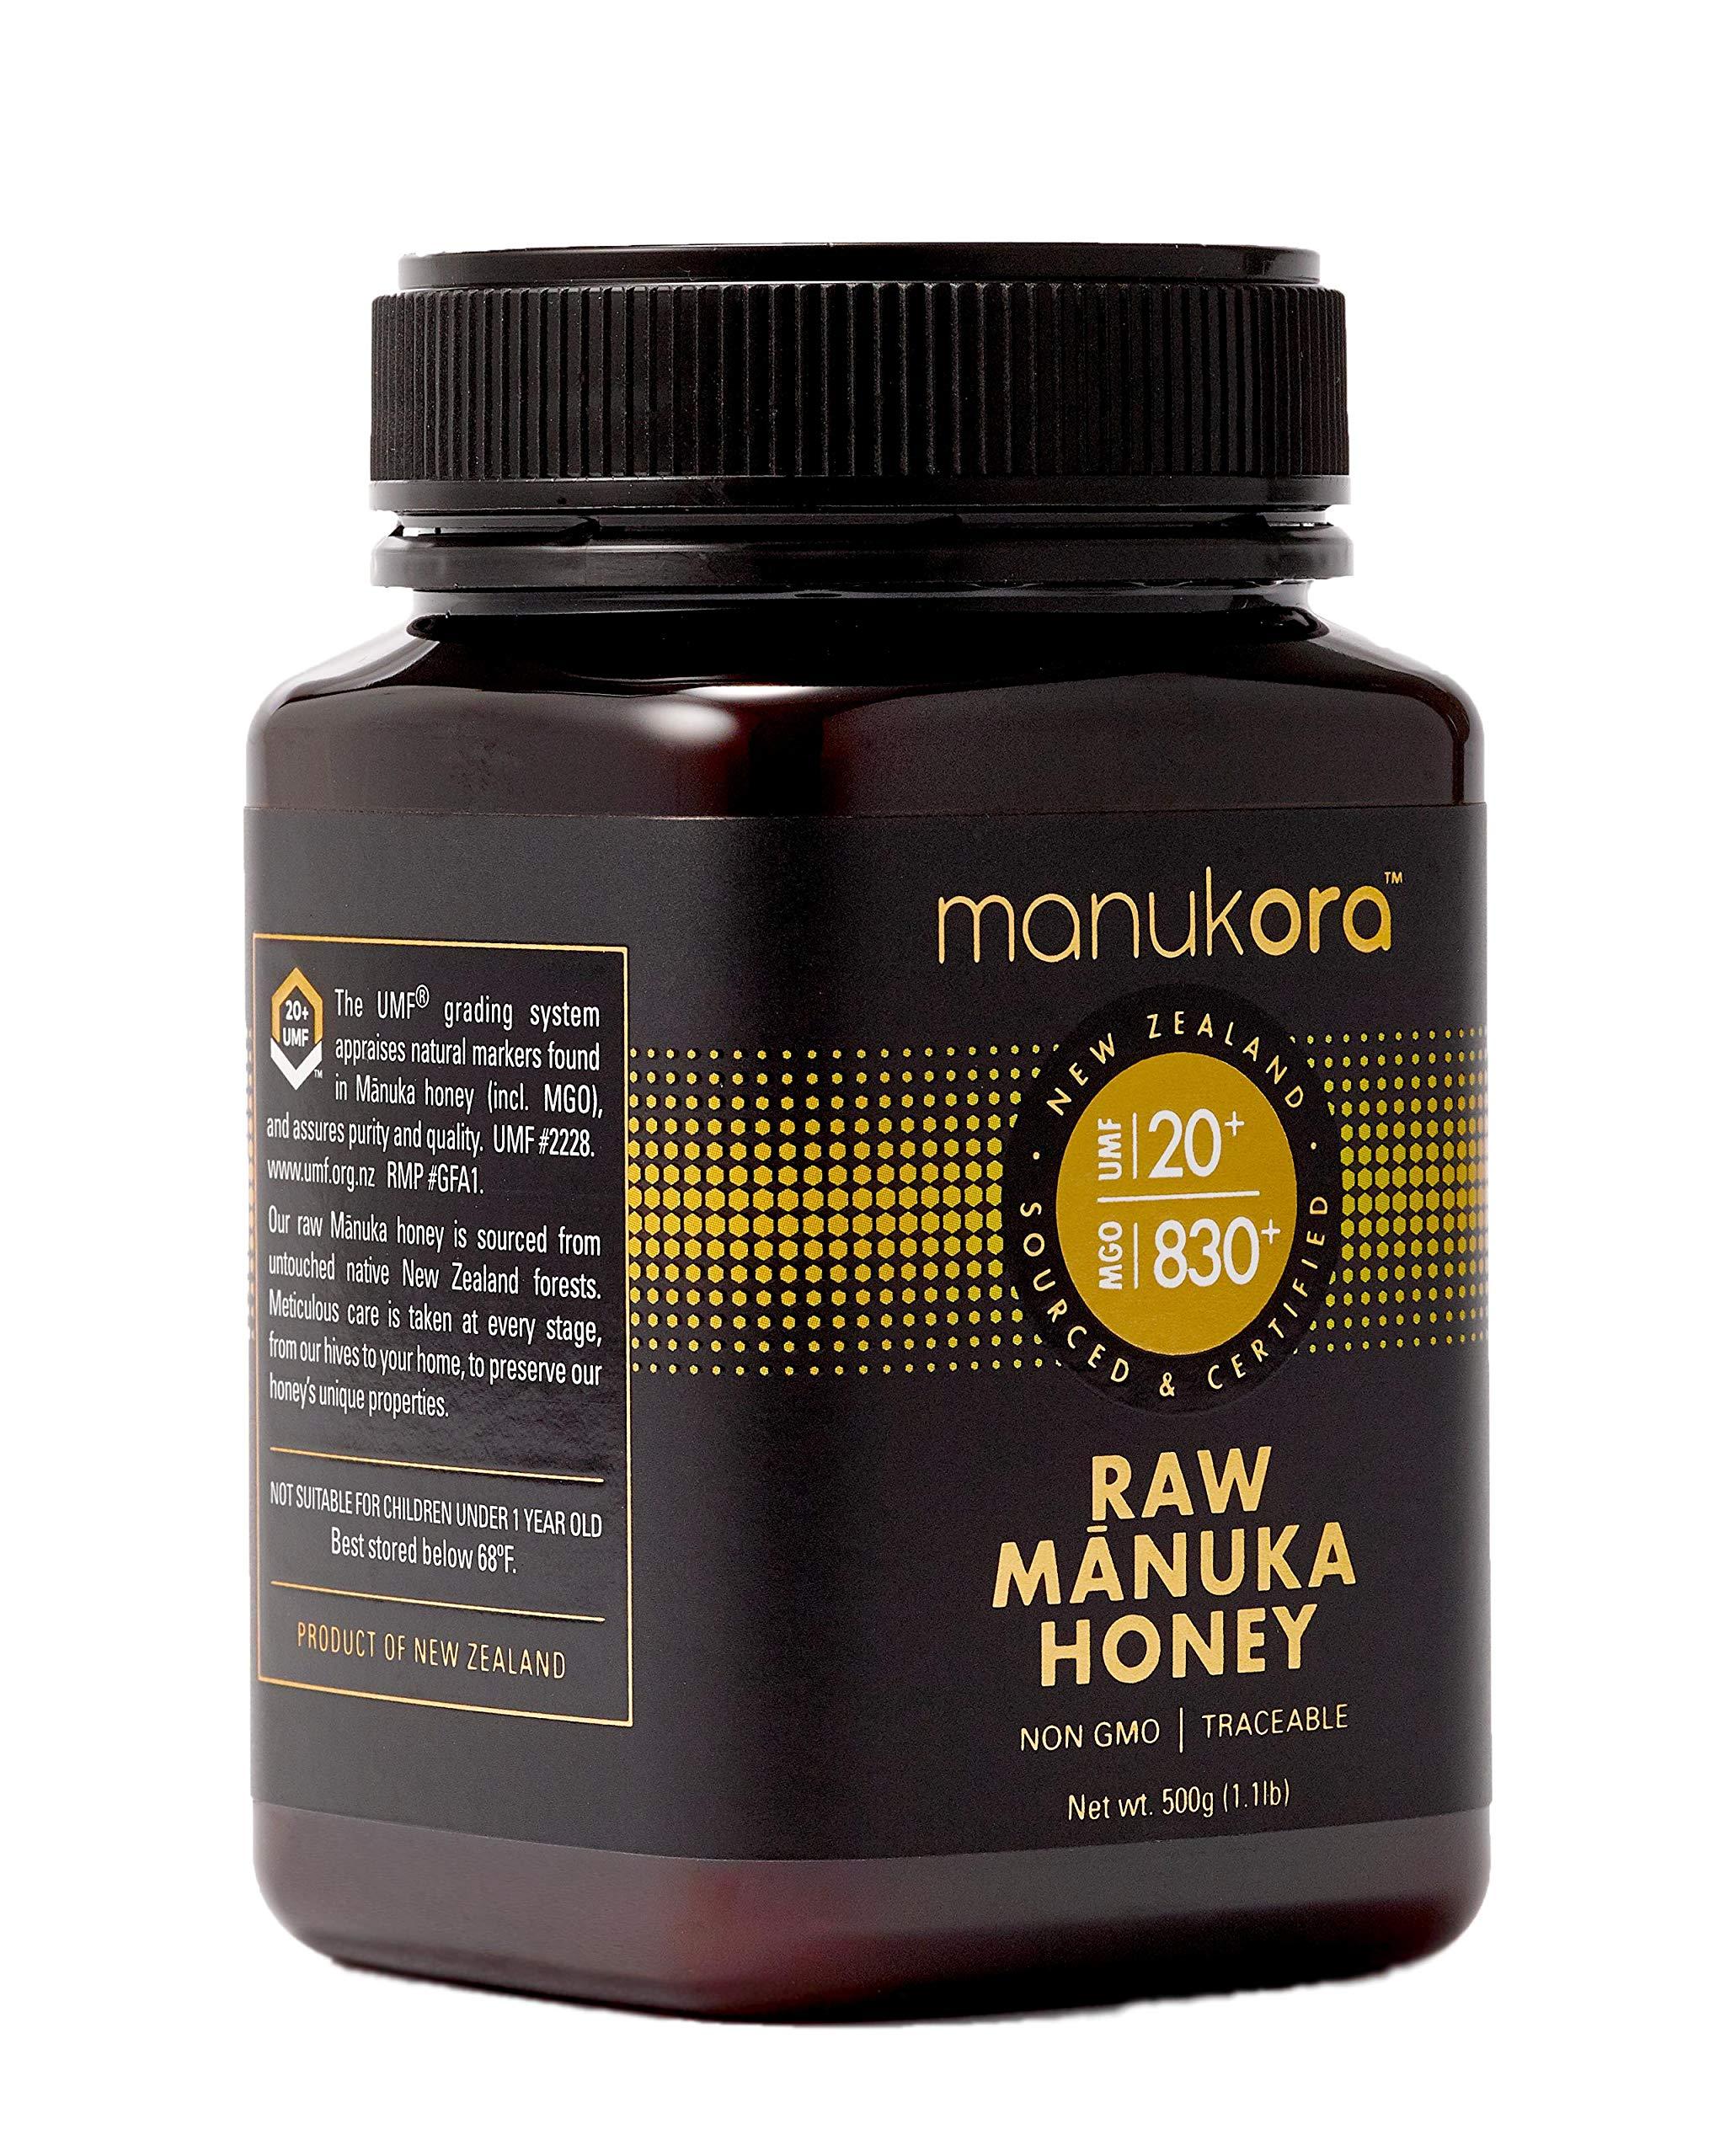 Manukora UMF 20+/MGO 830+ Raw Mānuka Honey (500g/1.1lb) Authentic Non-GMO New Zealand Honey, UMF & MGO Certified, Traceable from Hive to Hand by Manukora (Image #3)